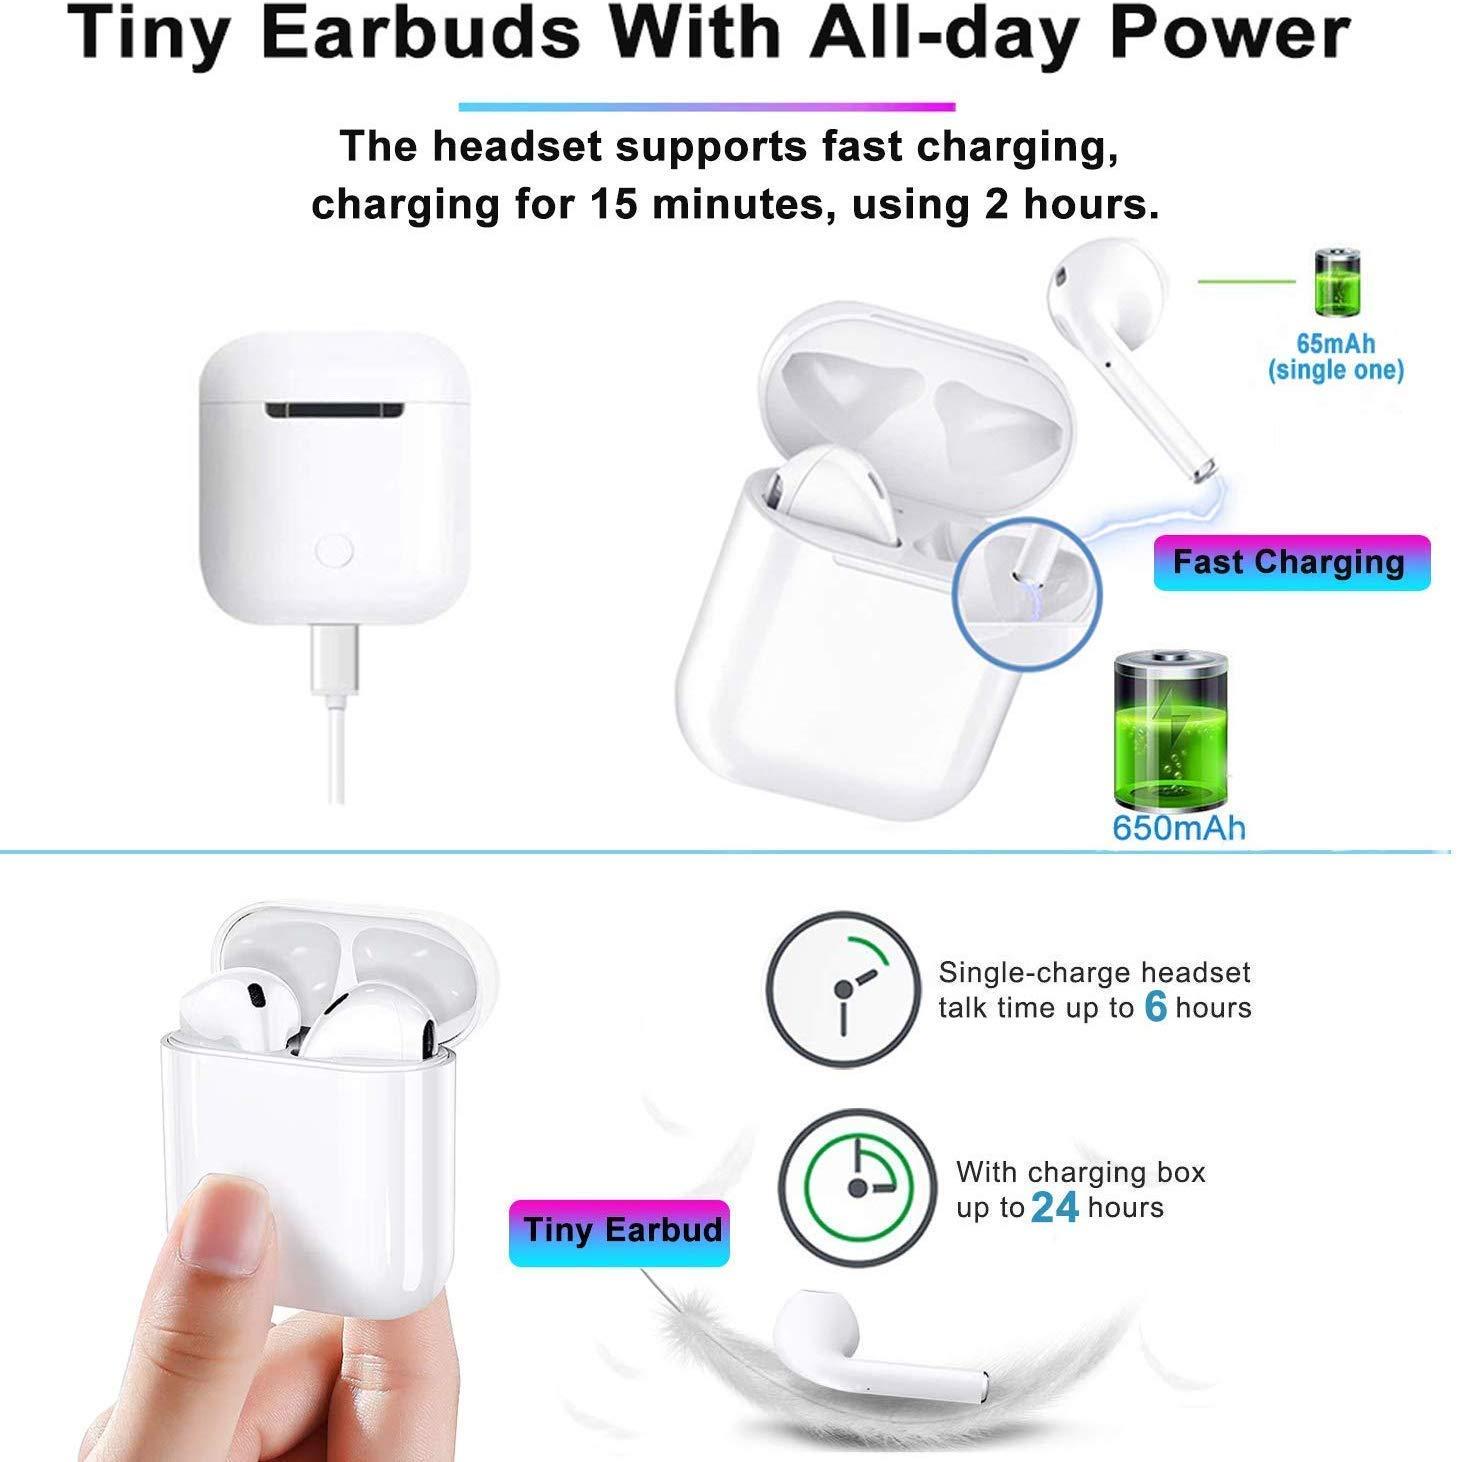 WKING-7 Bluetooth Headsets Wireless Headsets 5.0 Headset Bluetooth In-Ear-Kopfh/örer Wireless Stereo In-Ear-Freisprecheinrichtung f/ür Apple Airpods Android//iPhone1012